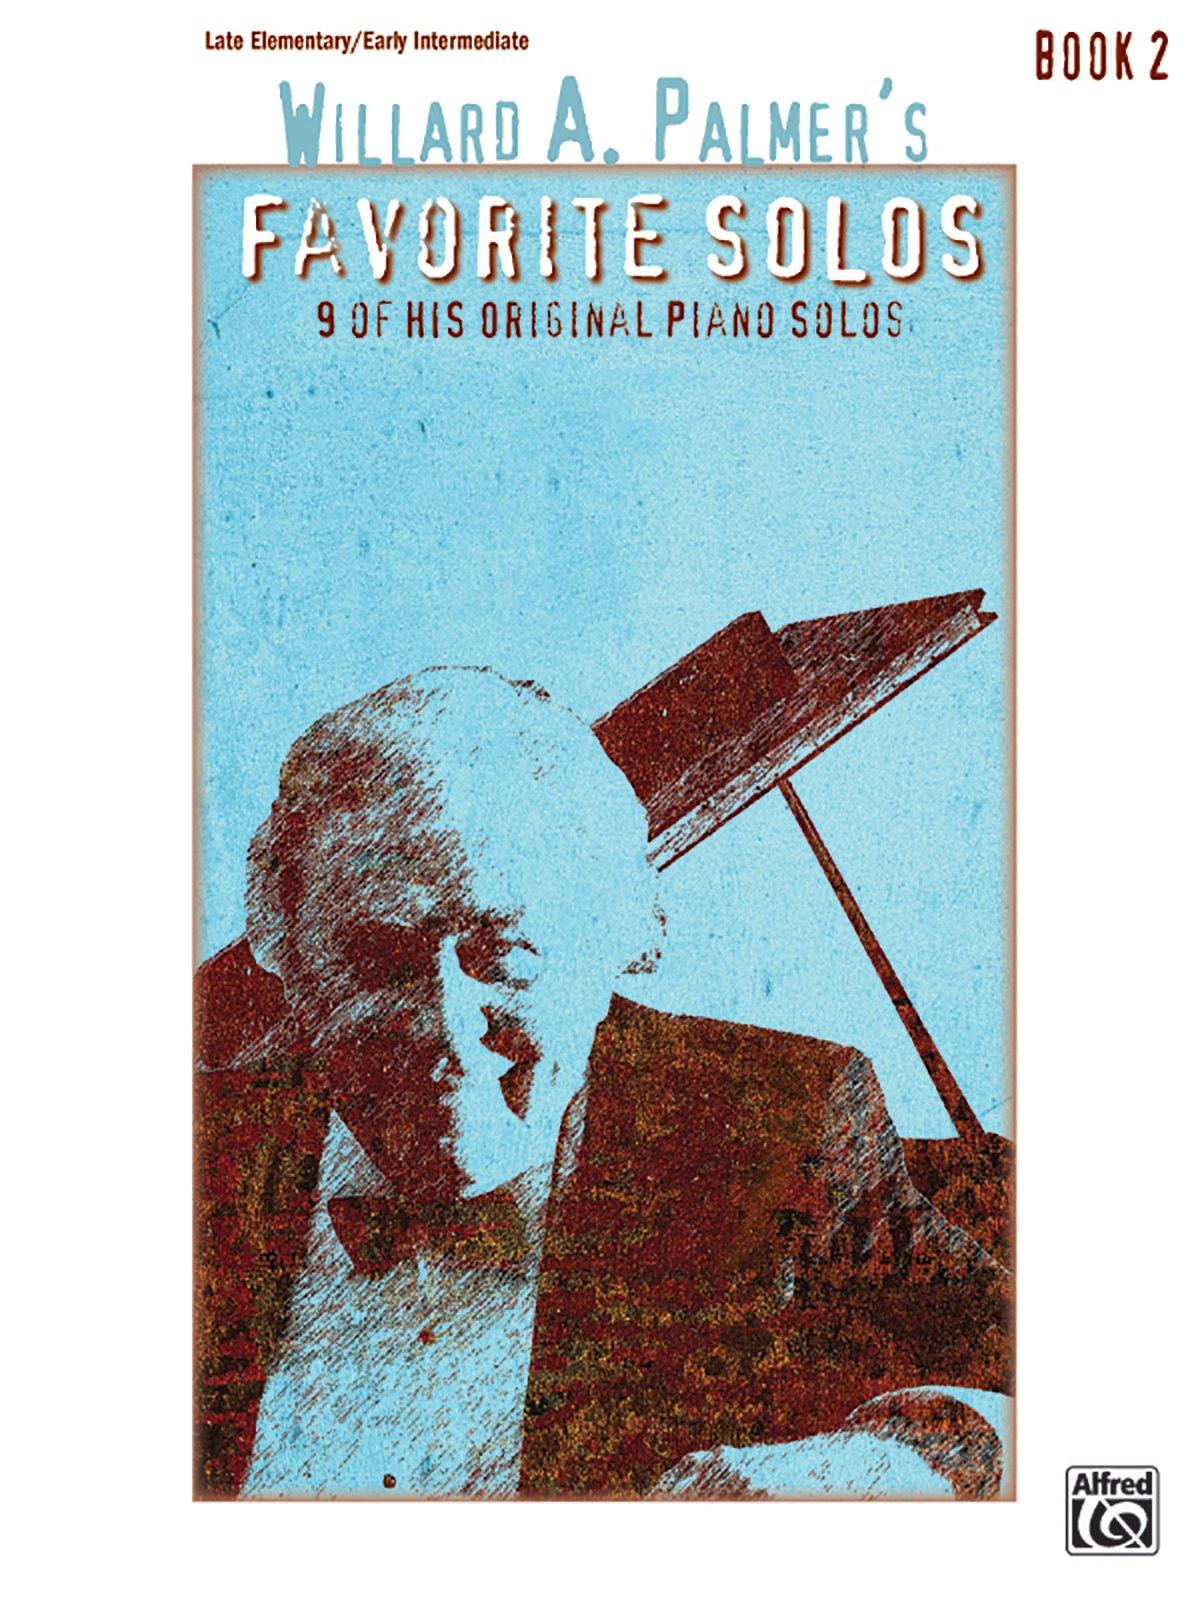 Willard A. Palmer's Favorite Solos, Bk 2: 9 of His Original Piano Solos pdf